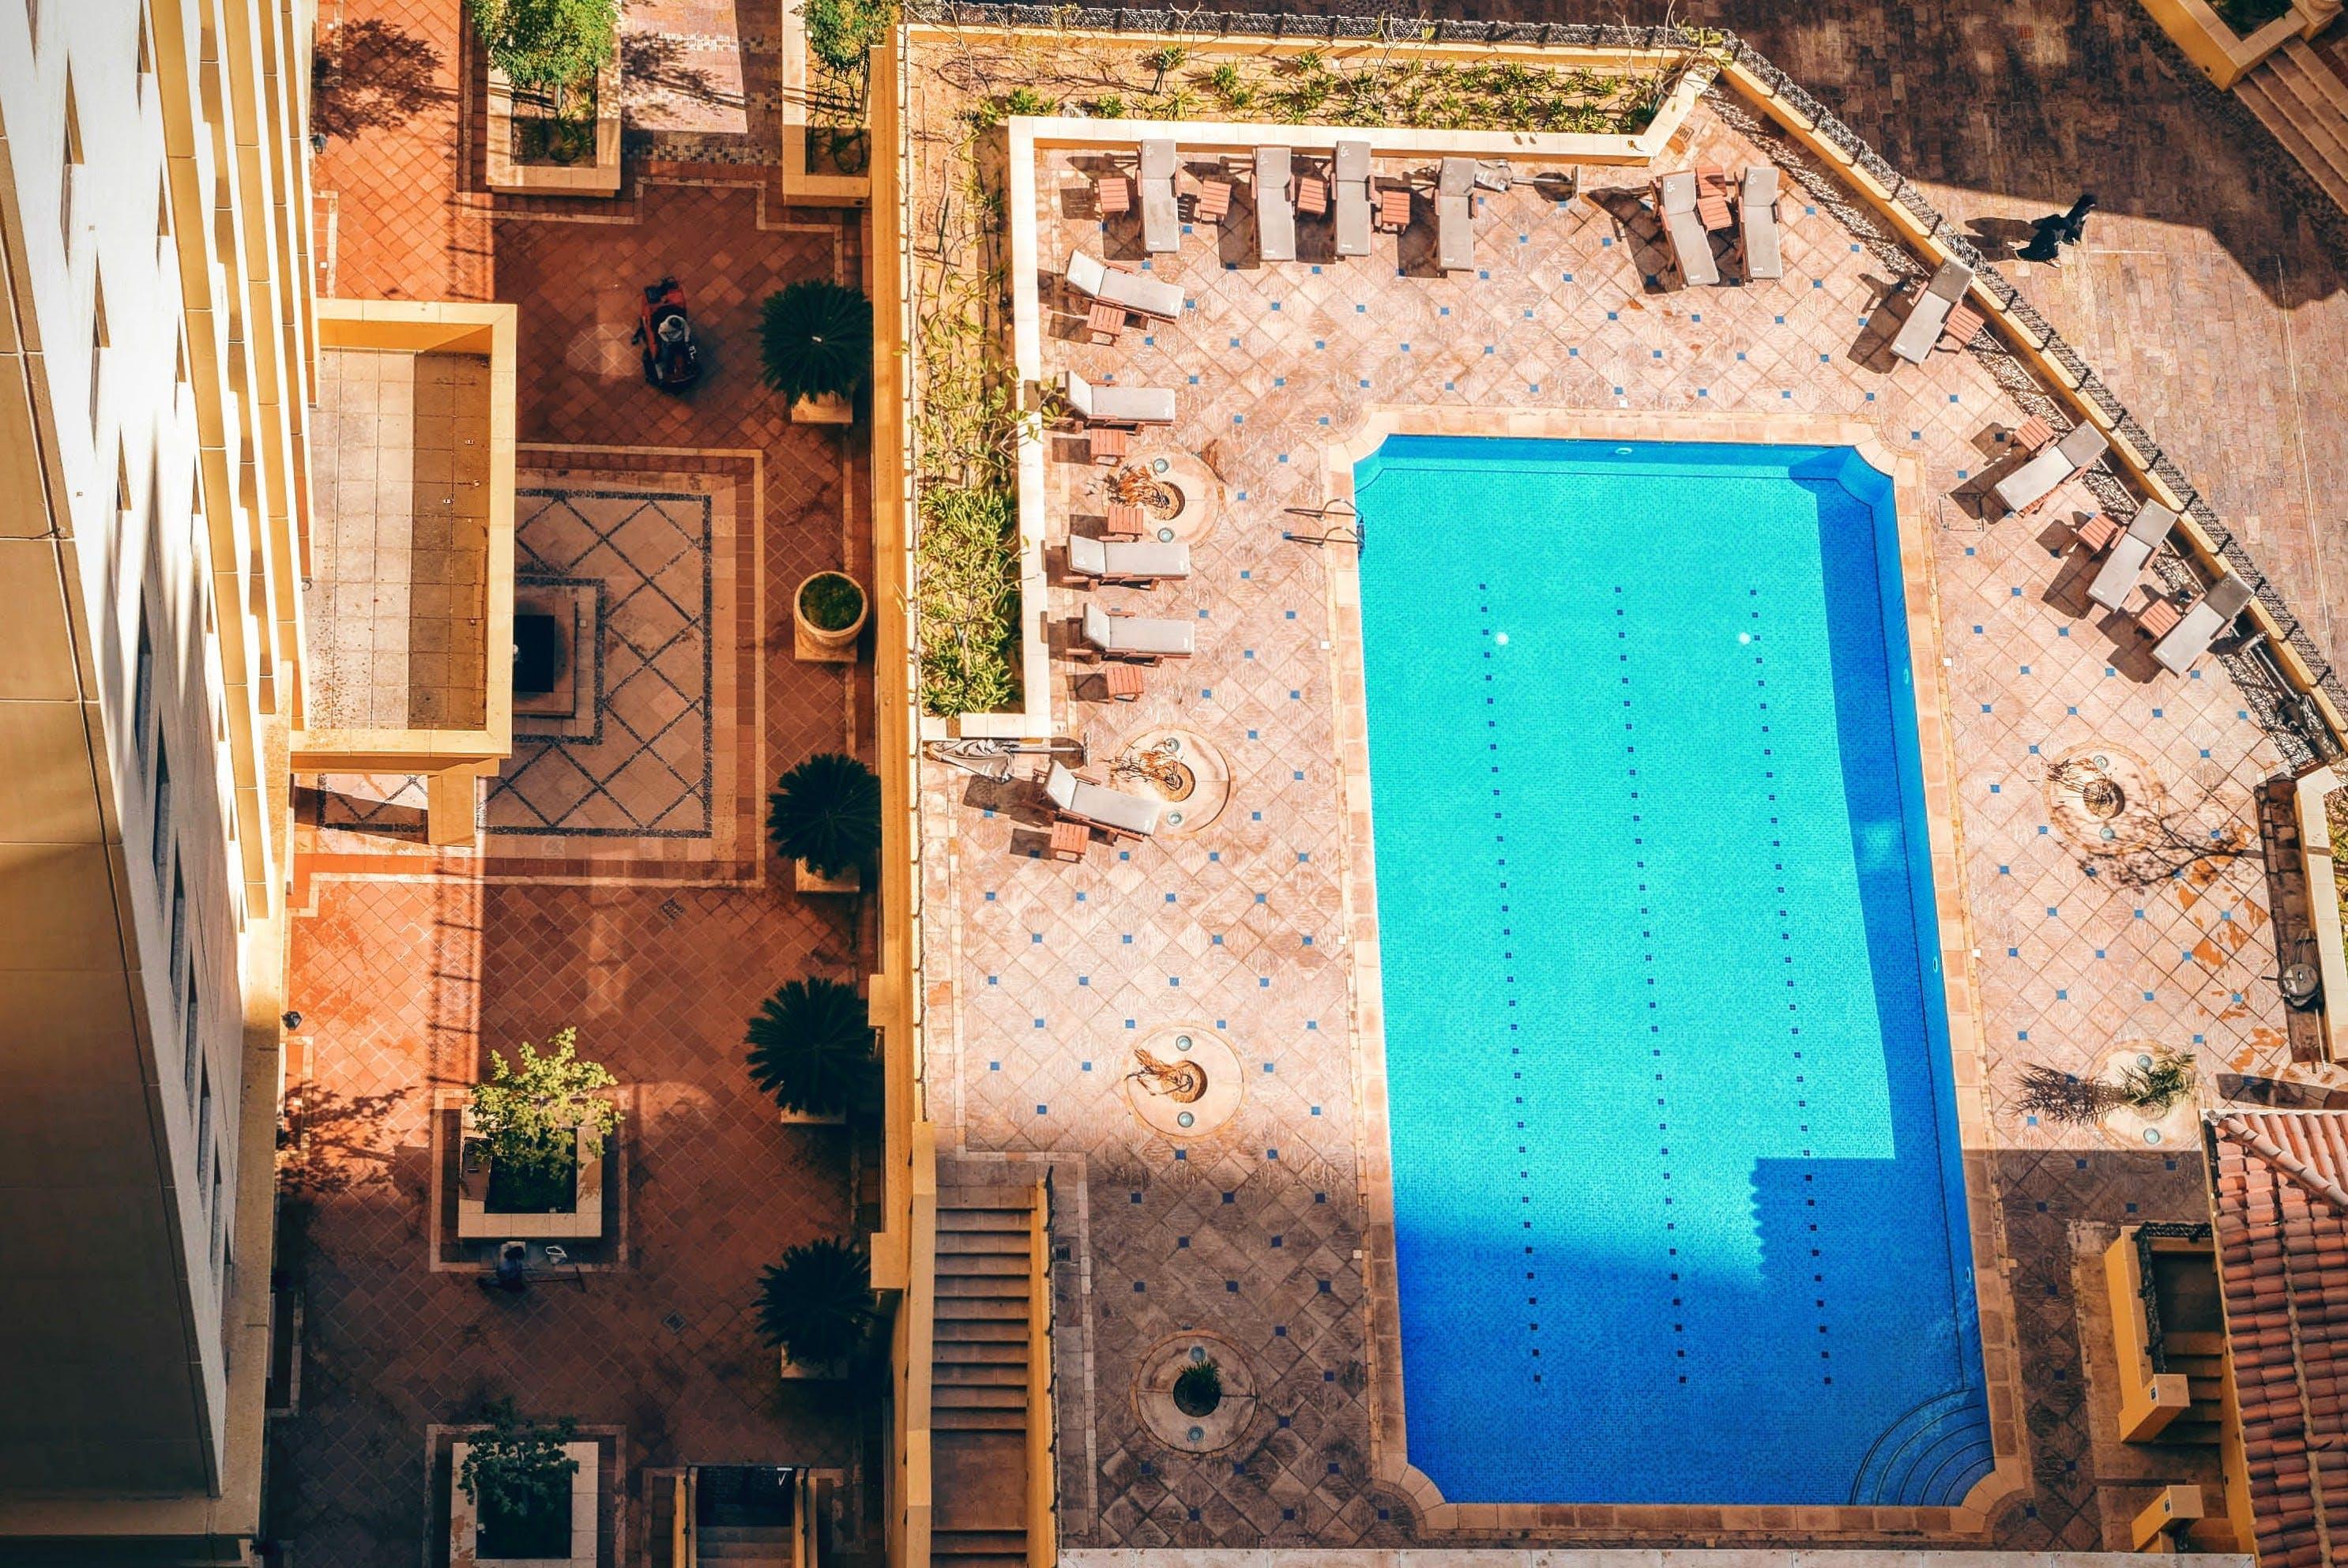 Rectangular Pool Near High Rise Building during Daytime